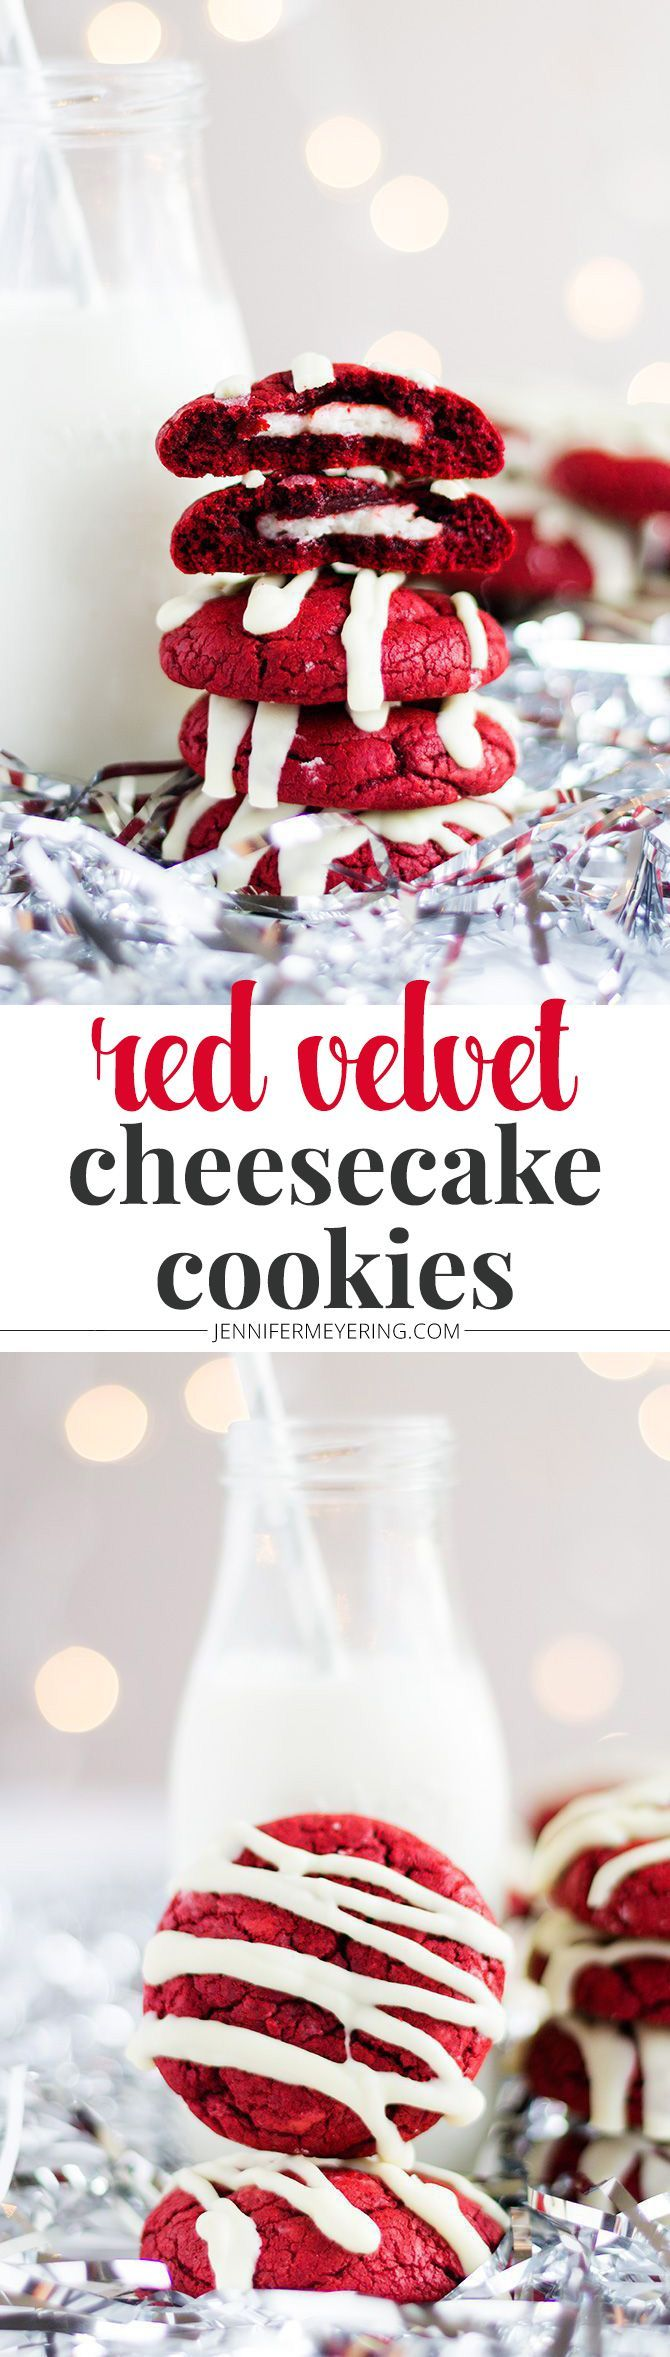 978 best SWEET / dessert recipes images on Pinterest | Chocolates ...